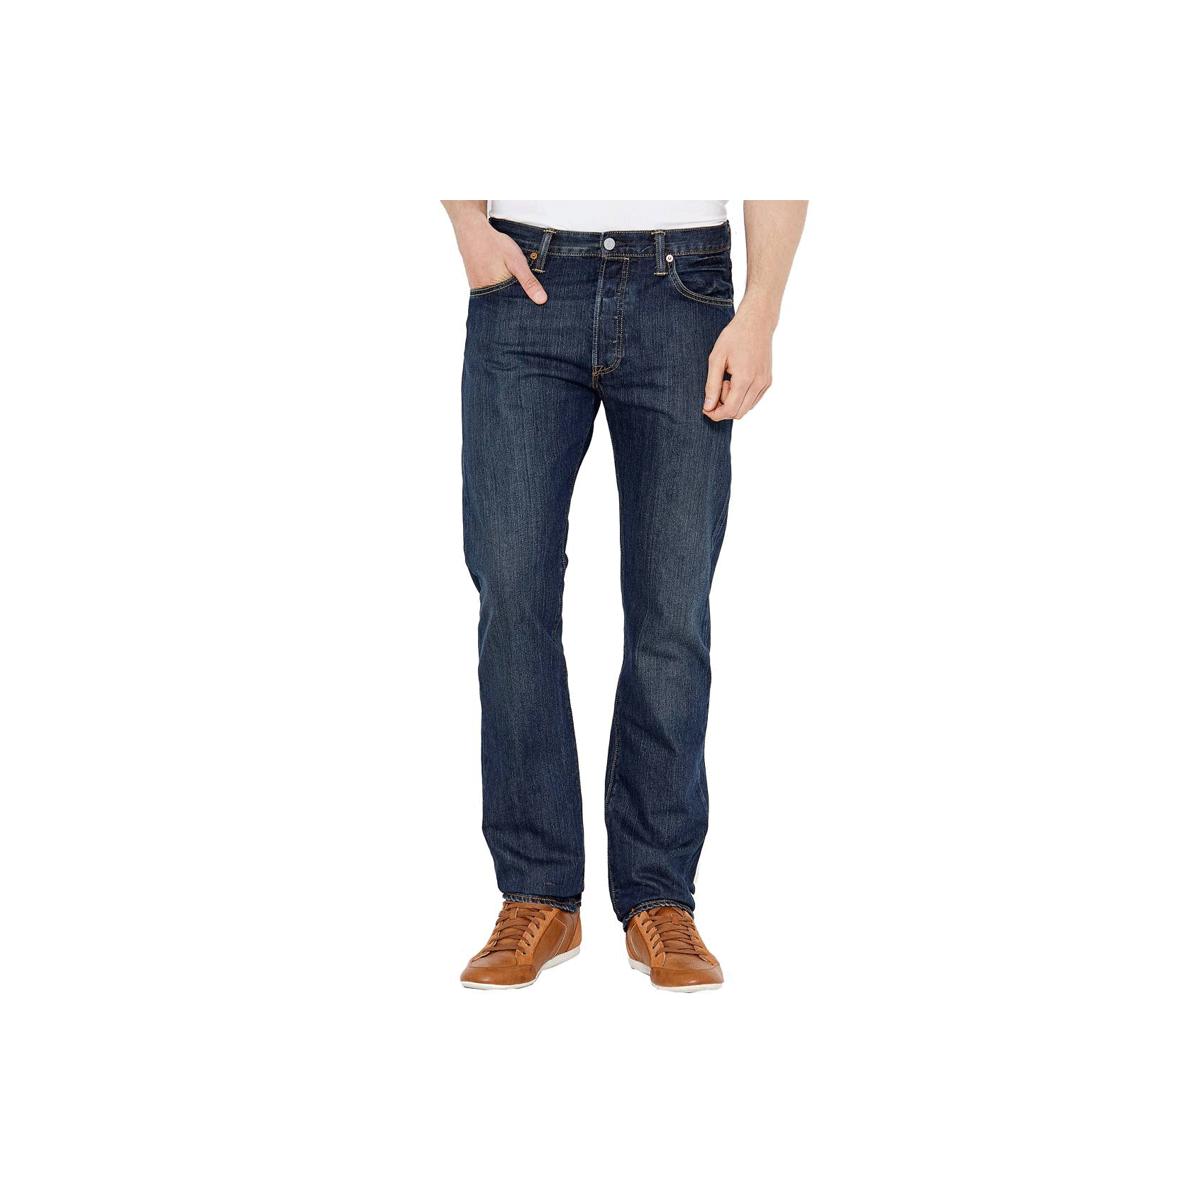 Jeans Levi's 501 Droite Regular 00501 Regular 00501 Regular 00501 Egxw6xq